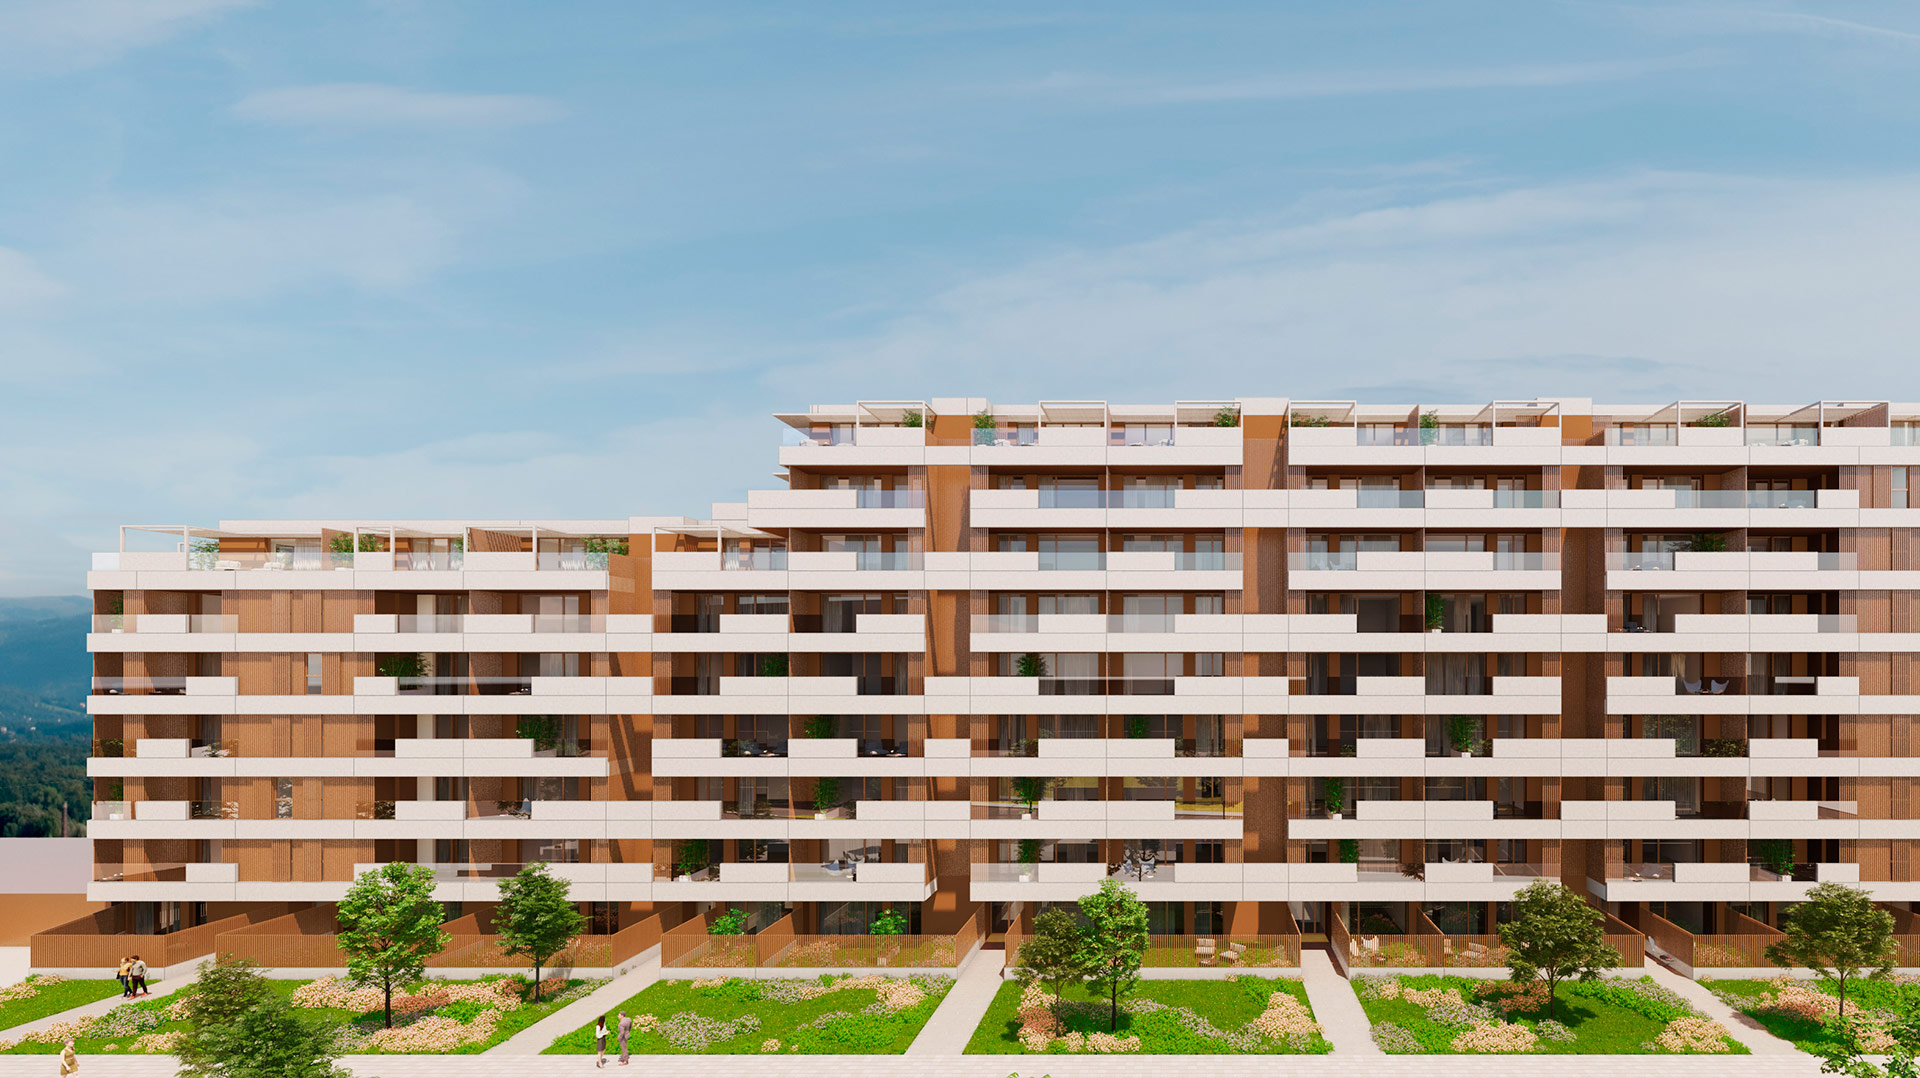 8_0_Port_Bara_V2019-21-32-SUR-Dia-slide-ByEarquitectos-pamplona-navarra